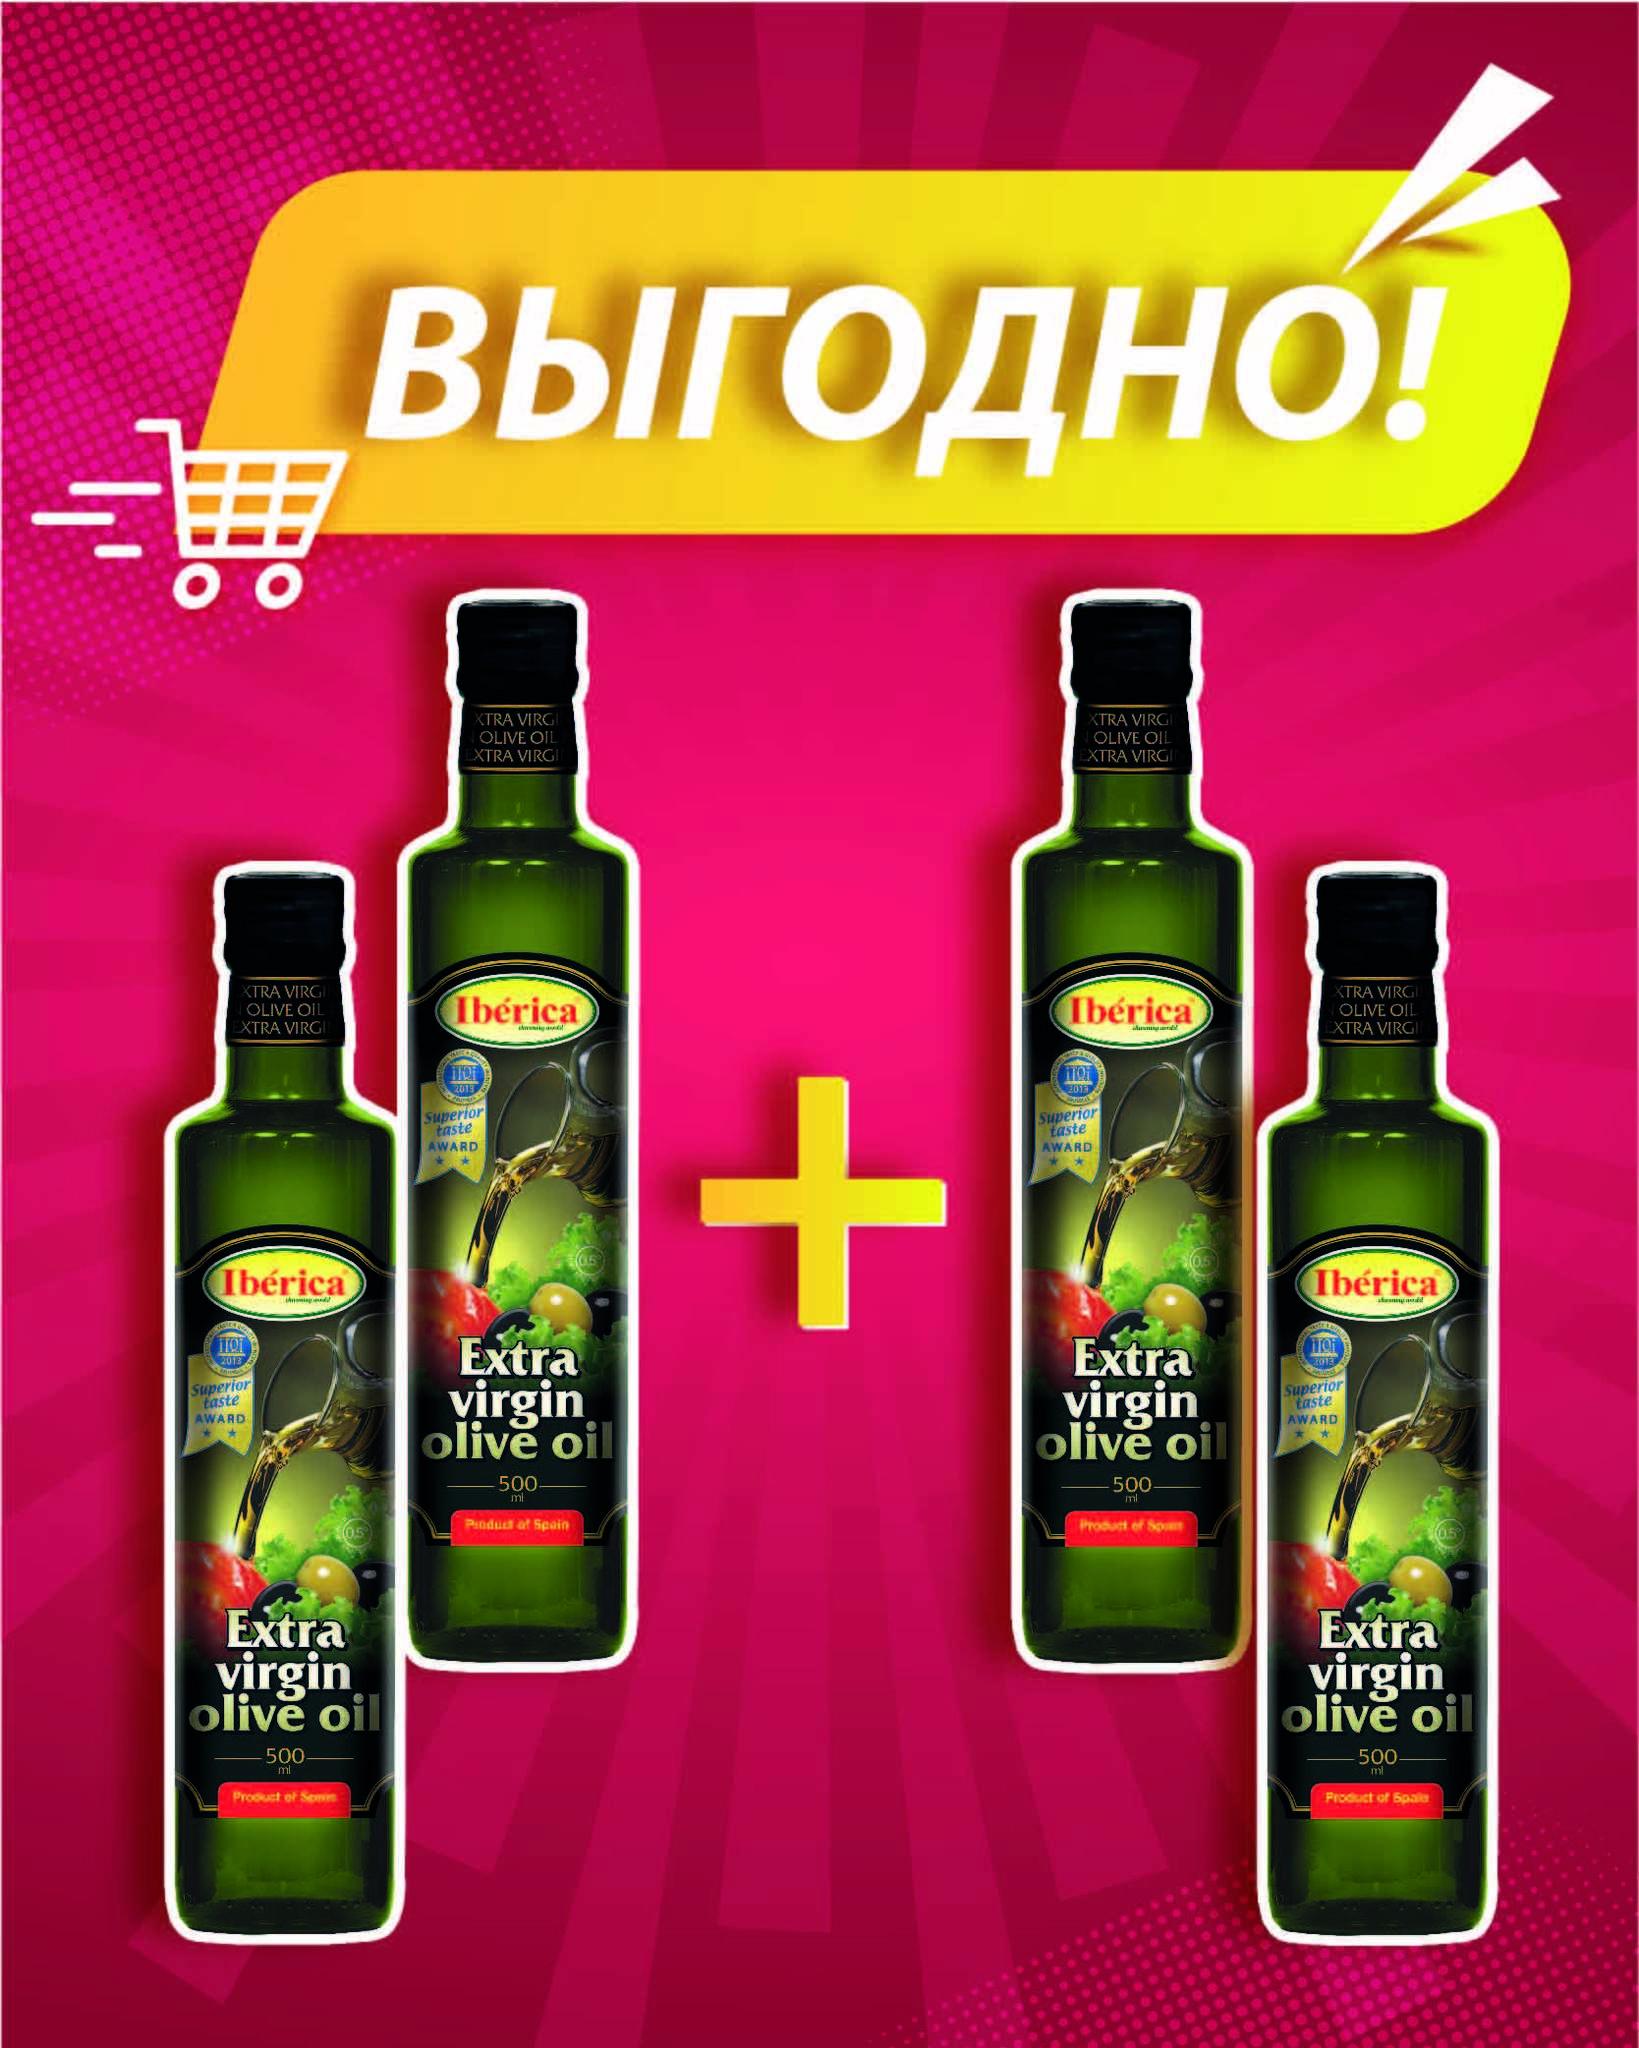 Набор Оливкового масла Iberica Экстра Вирджин 0,5л. из 4 шт.